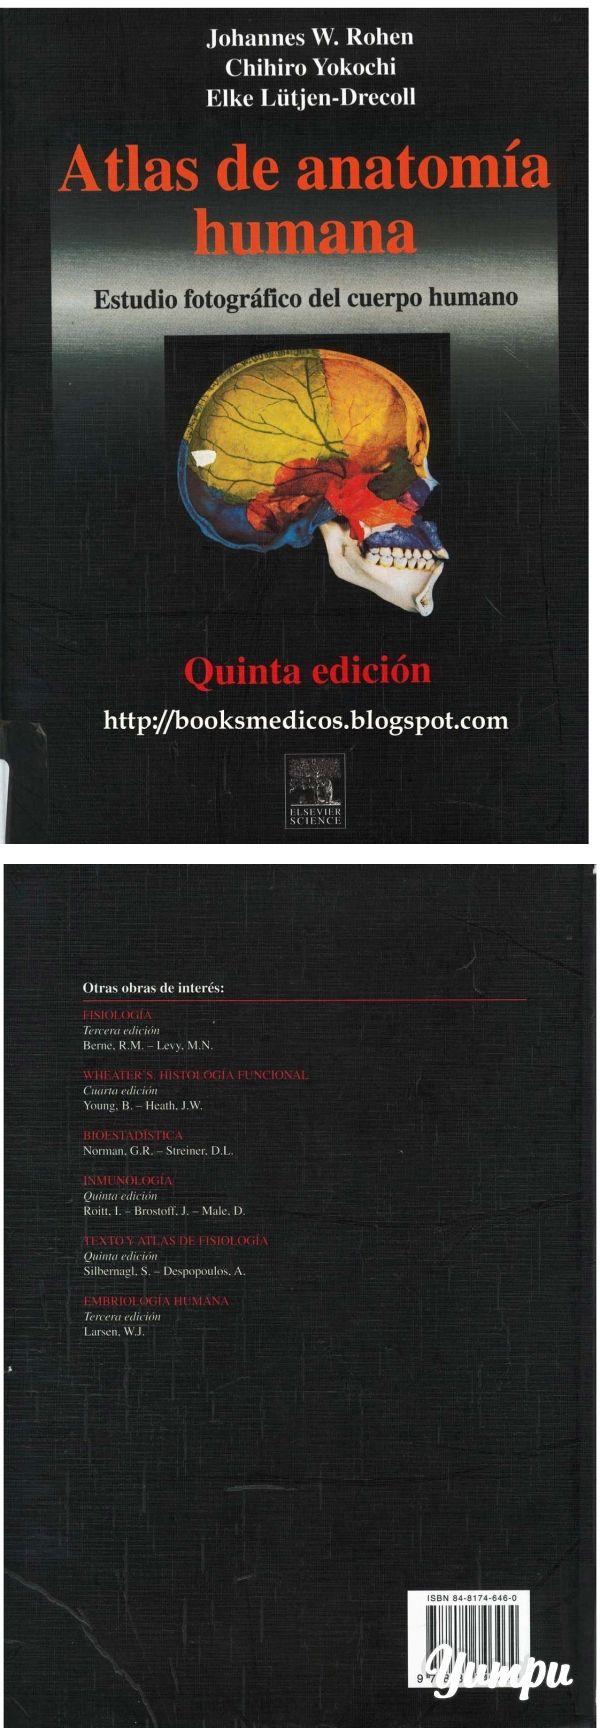 rohen-yokochi-atlas-de-anatomia.pdf-rohen-yokochi-atlas-de-anatomia.pdf